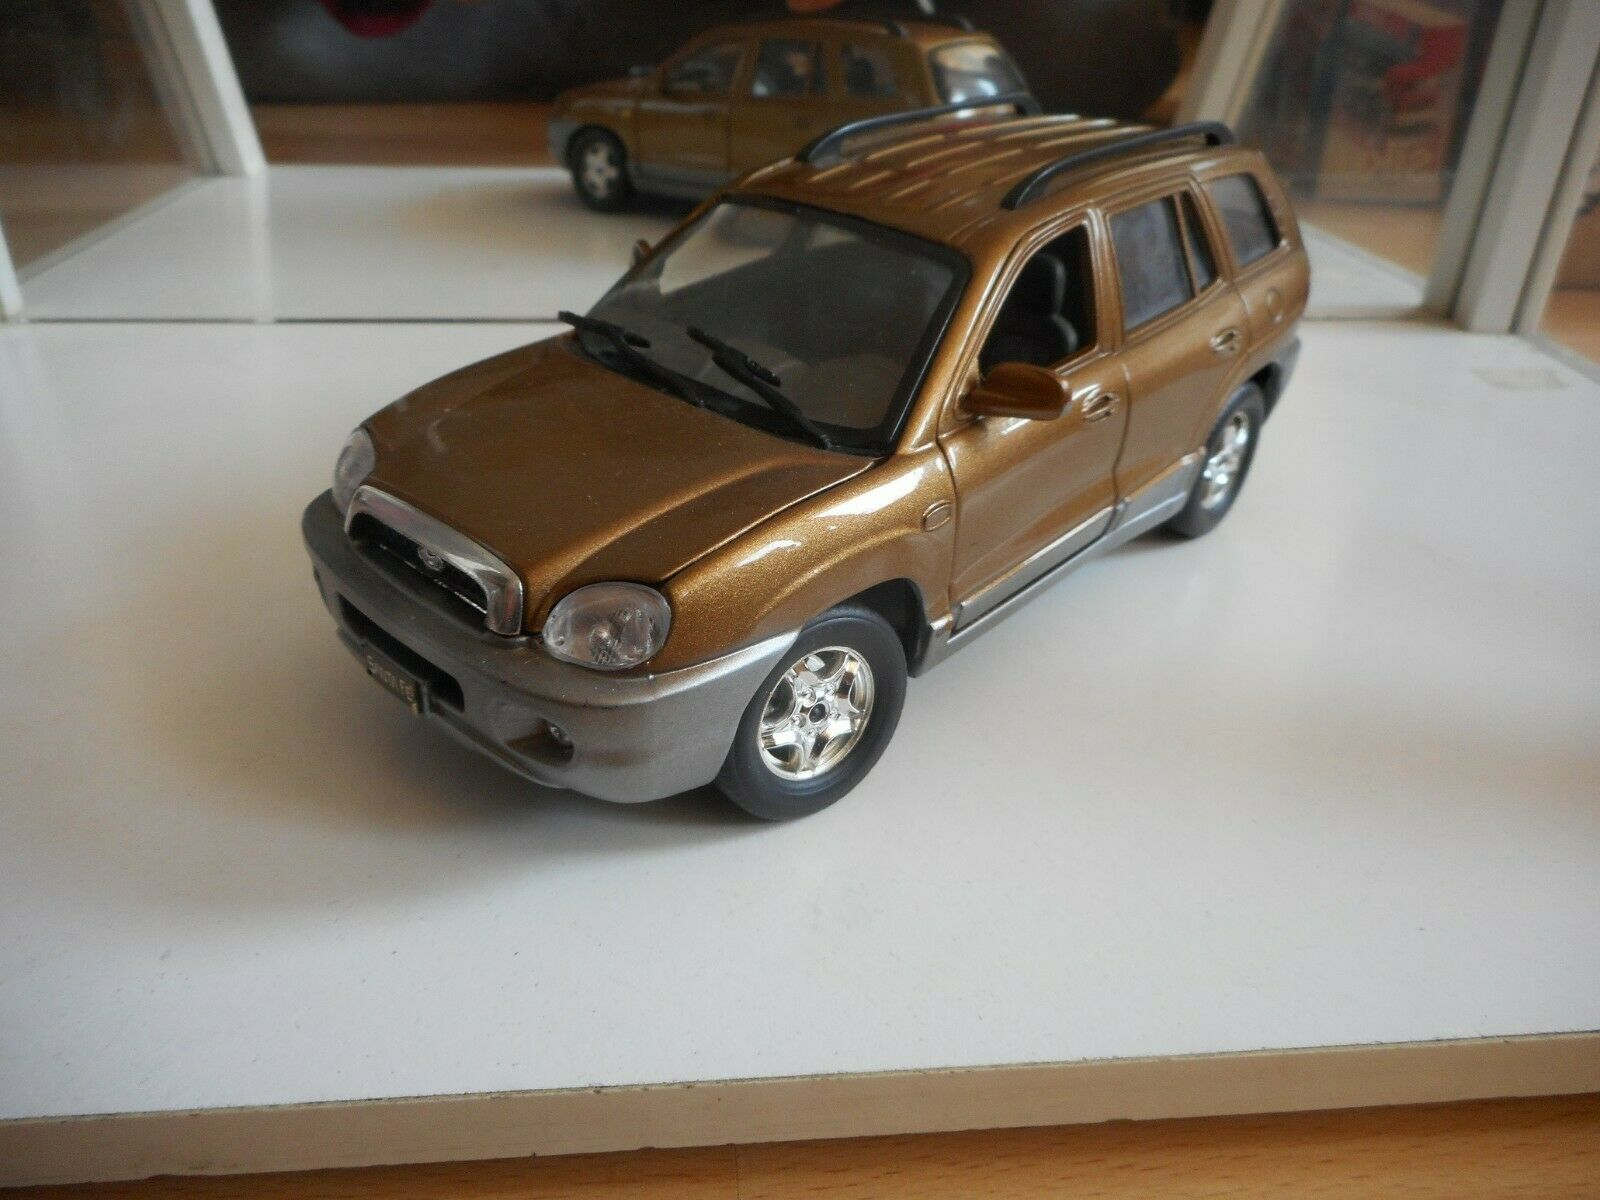 Genuine Accessory Hyundai Santafe 2000 in marrón on 1 24